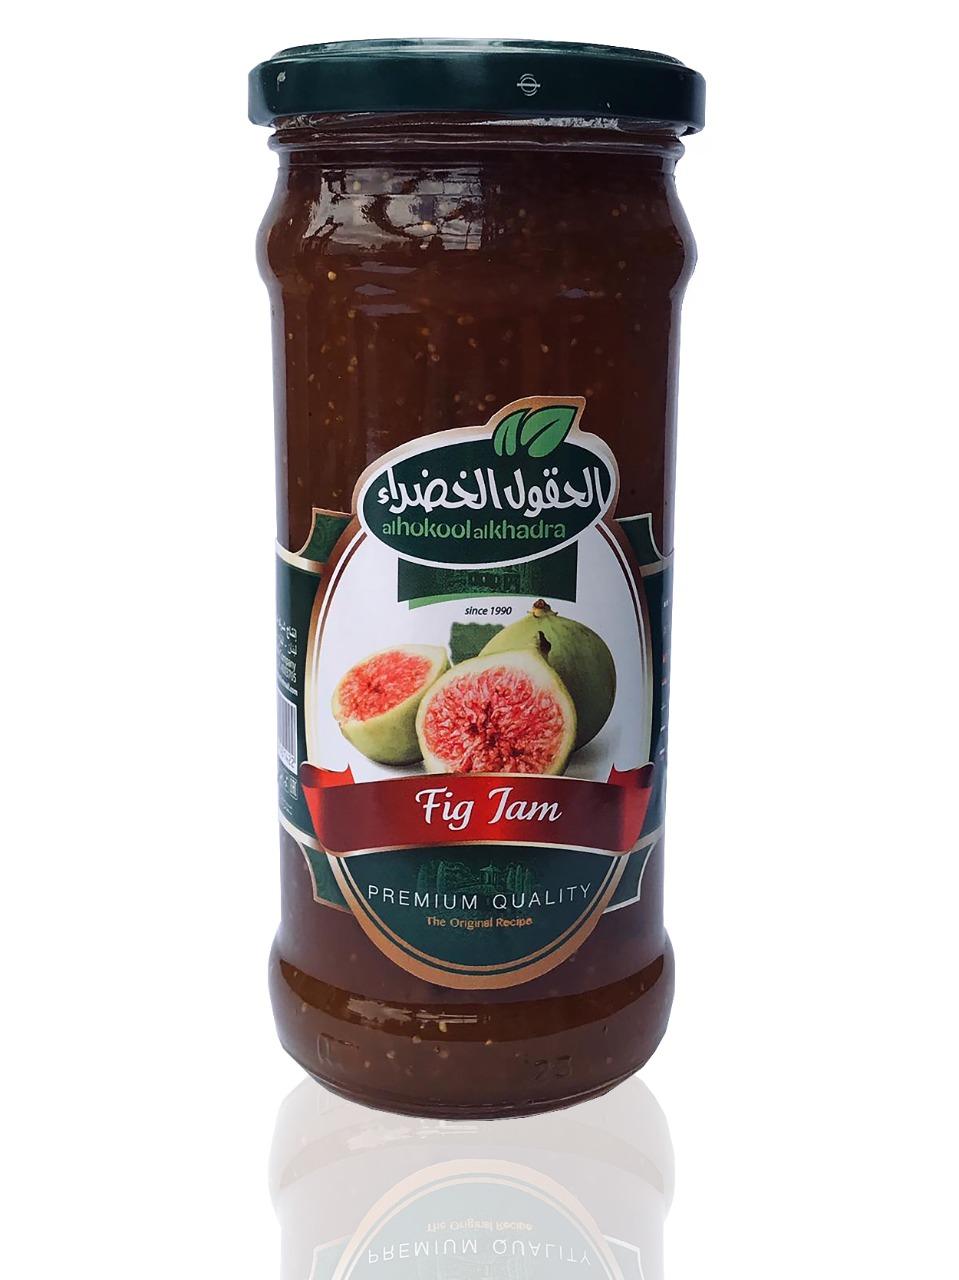 Al Hokool Al Khadraa Feigenmarmelade 450g(*12) مربى التين الحقول الخضراء